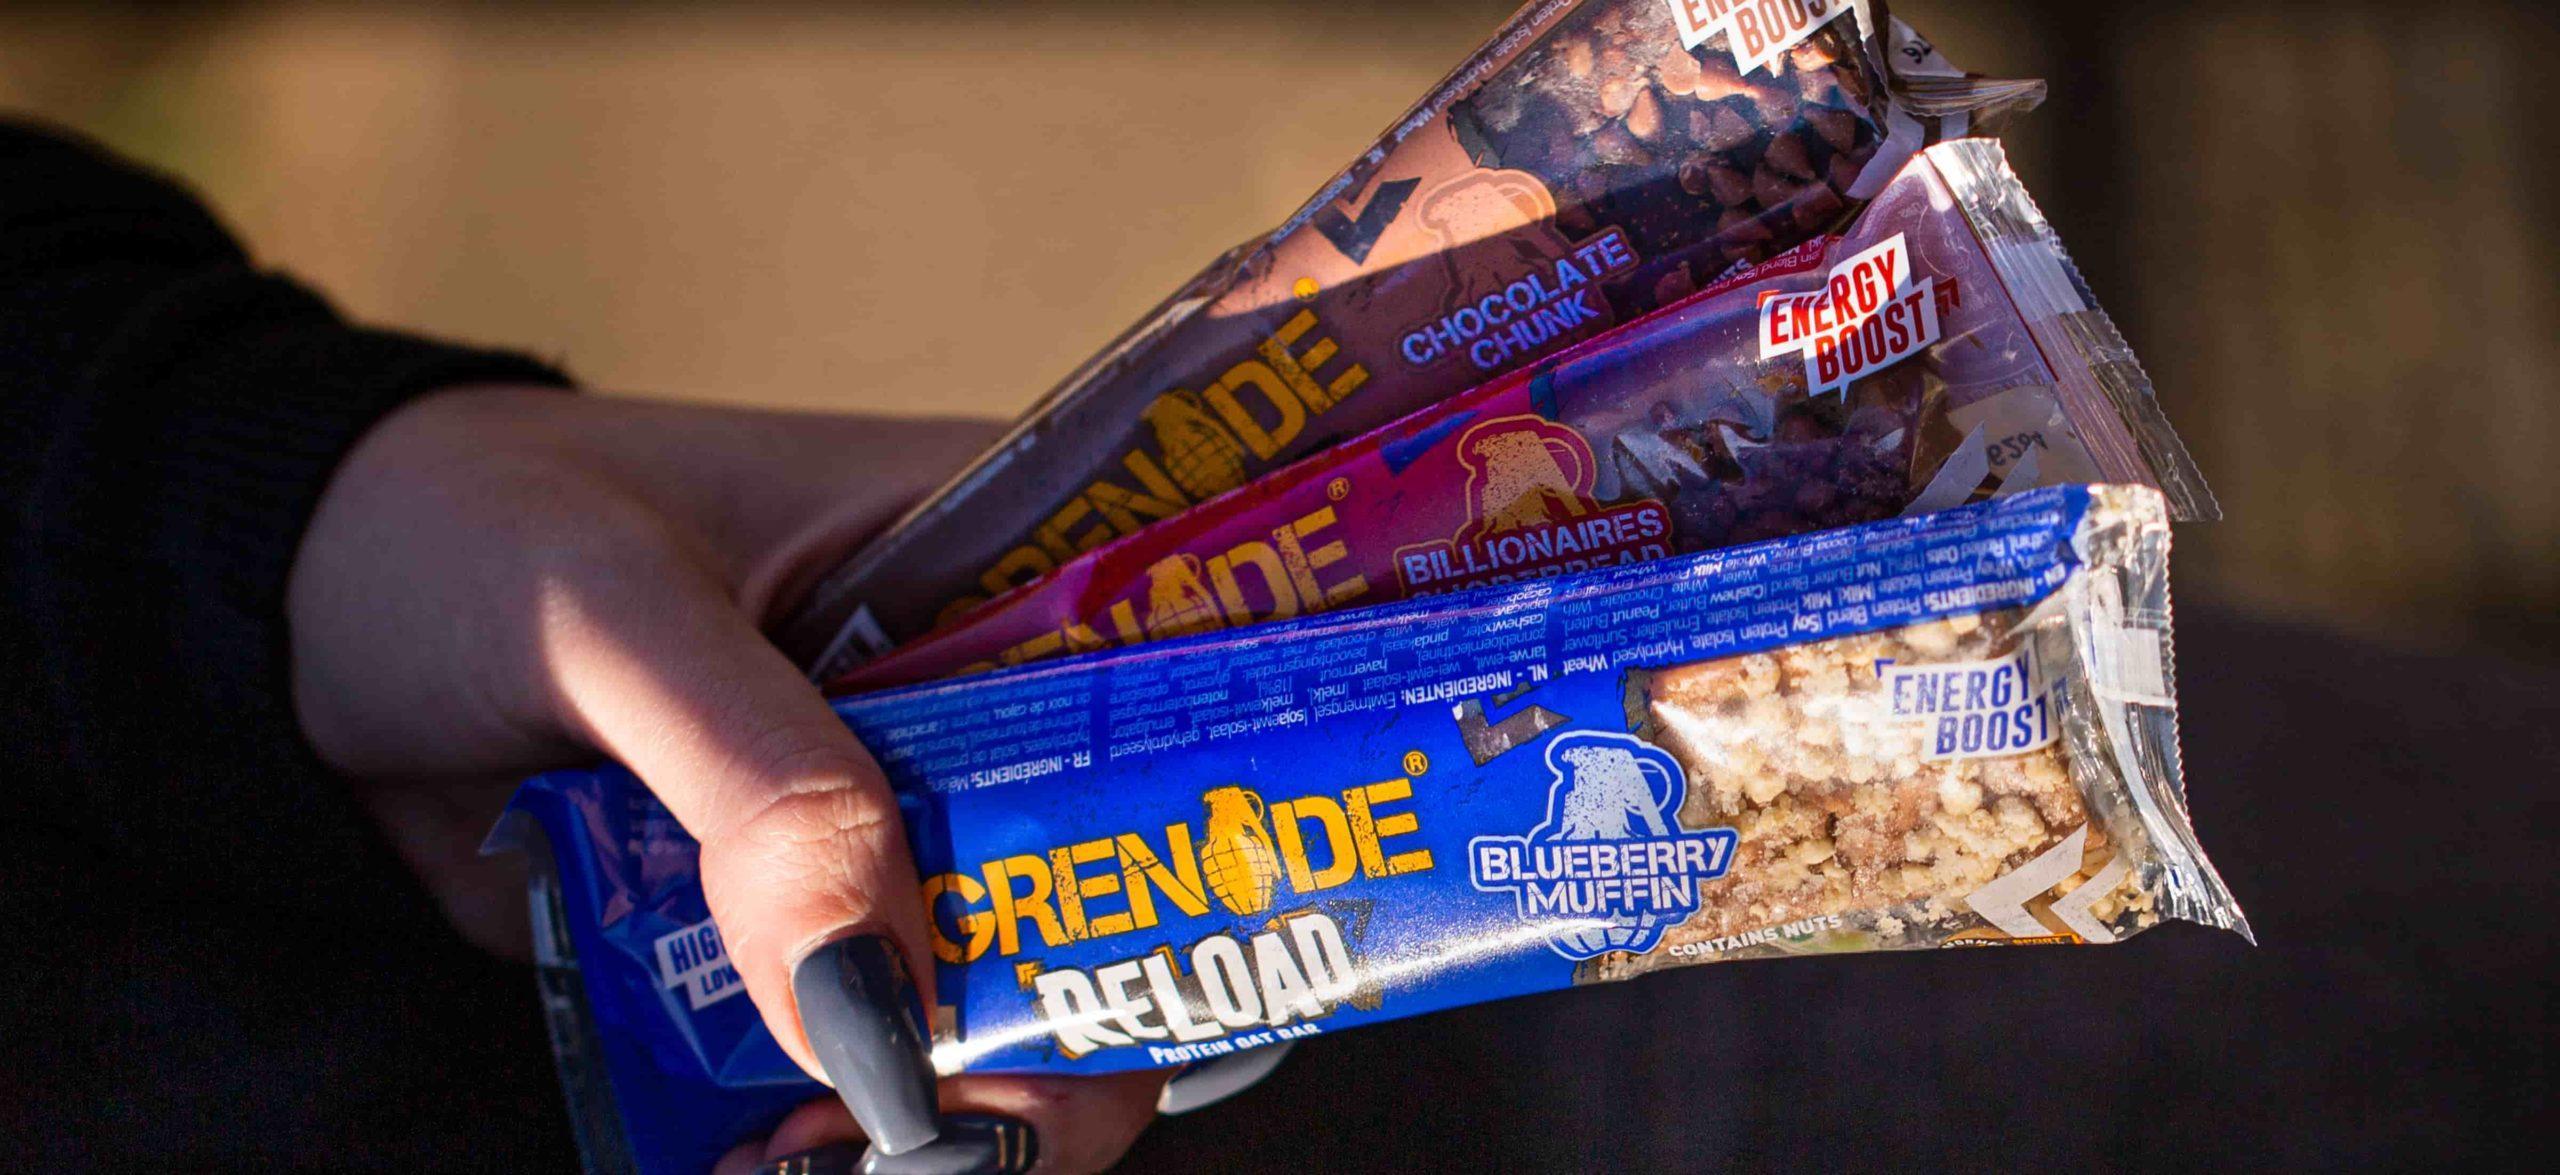 Grenade Reload oat energy bar